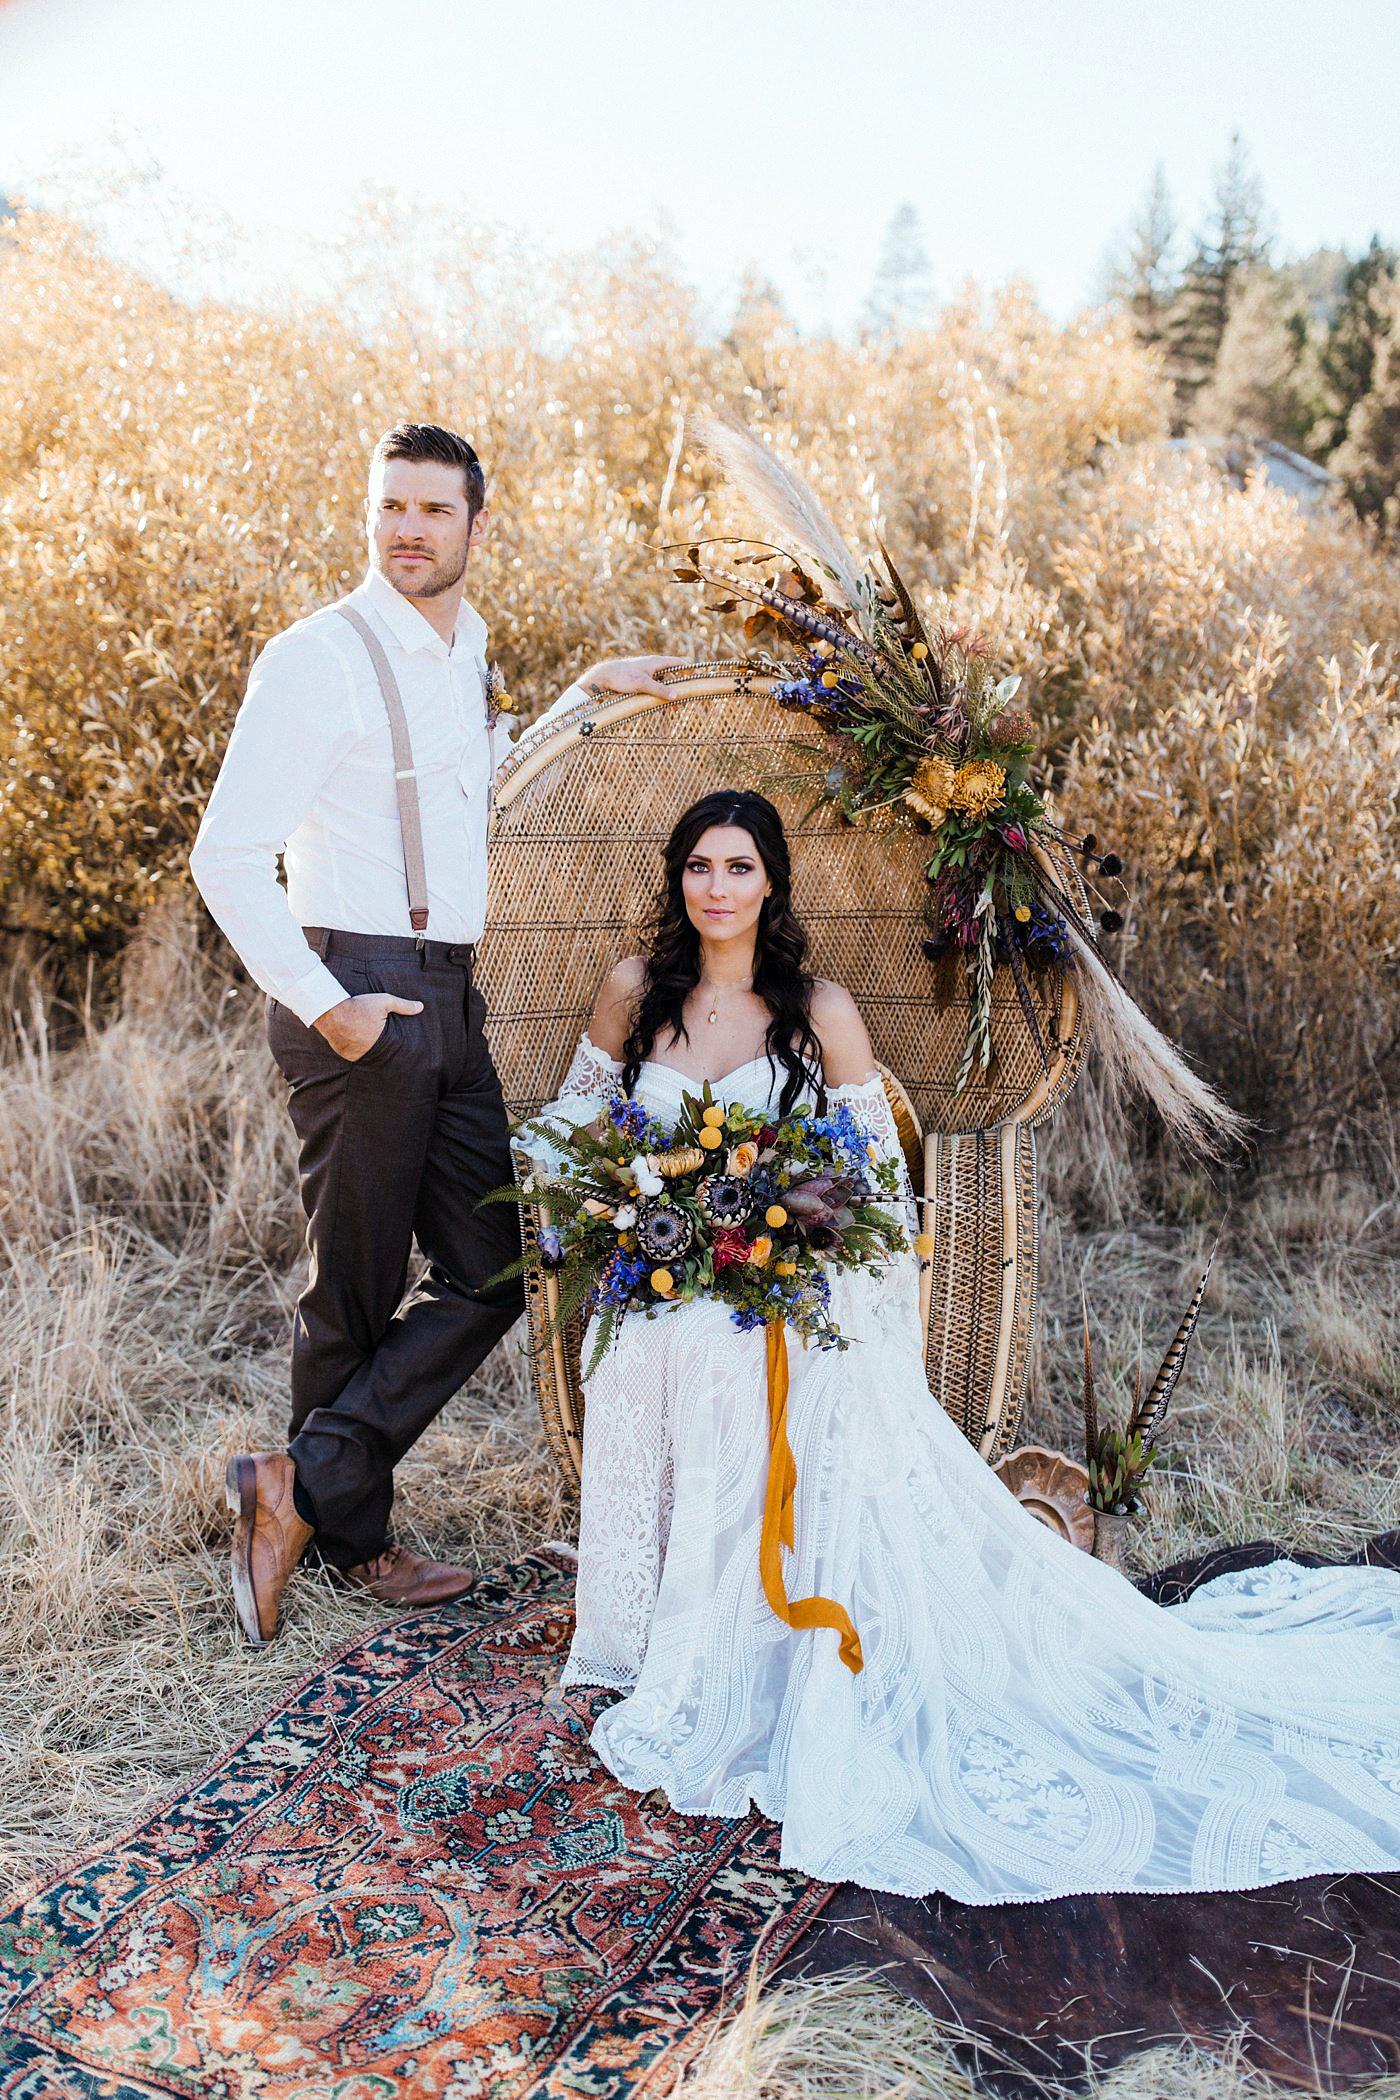 Becca Kufrin Garrett Yrigoyen Pre-Wedding Shoot - The pair looked ready to wed in dapper attire.